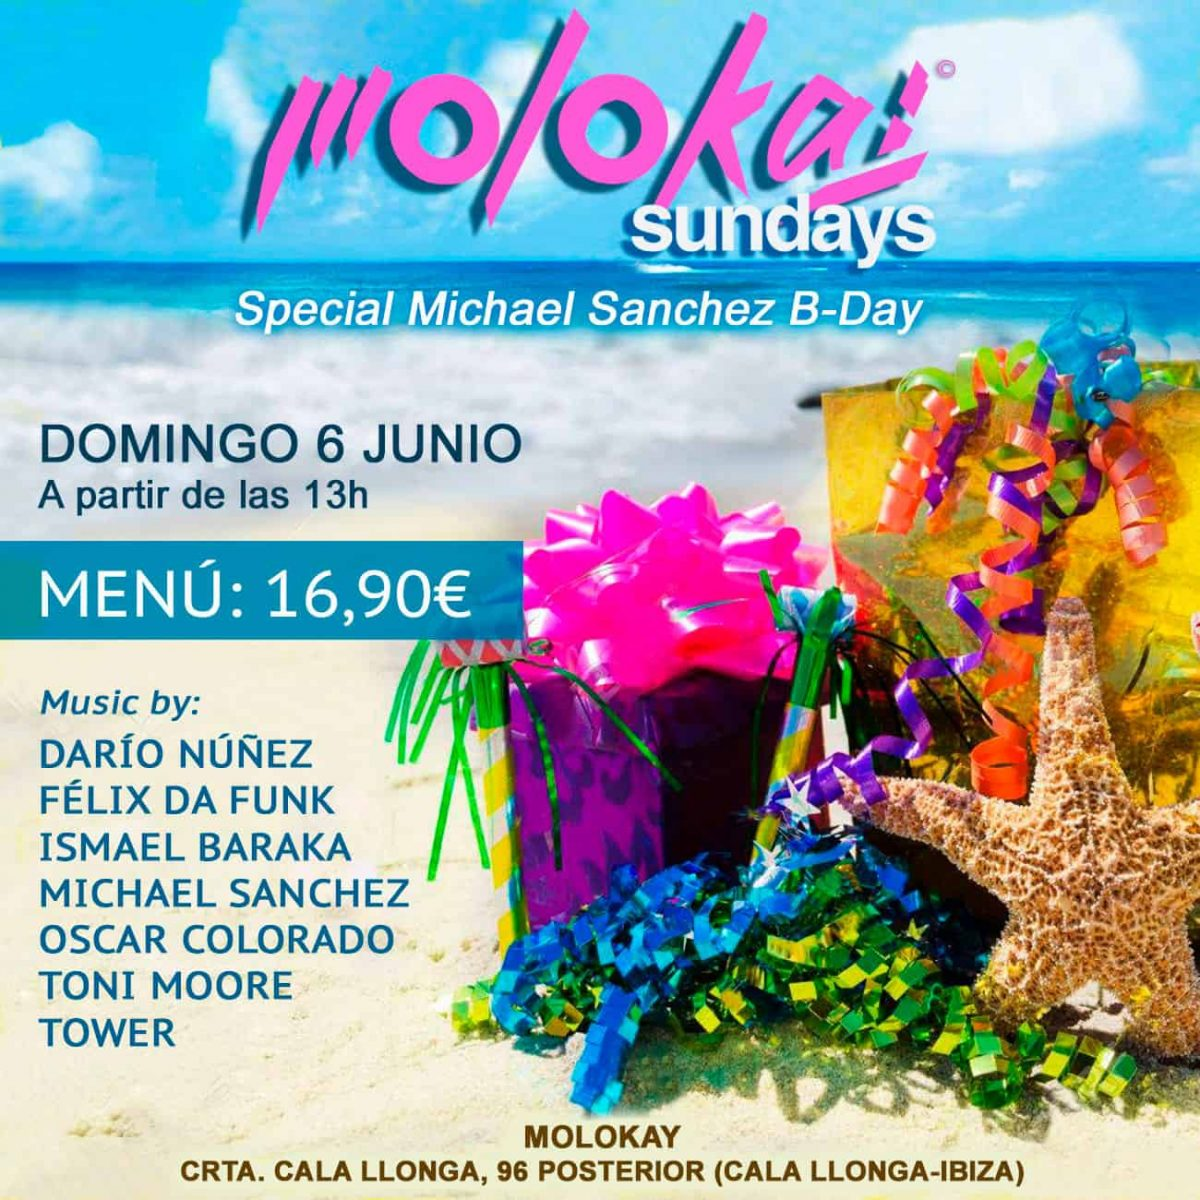 molokay-sundays-special-michael-sanchez-b-day-ibiza-2021-welcometoibiza